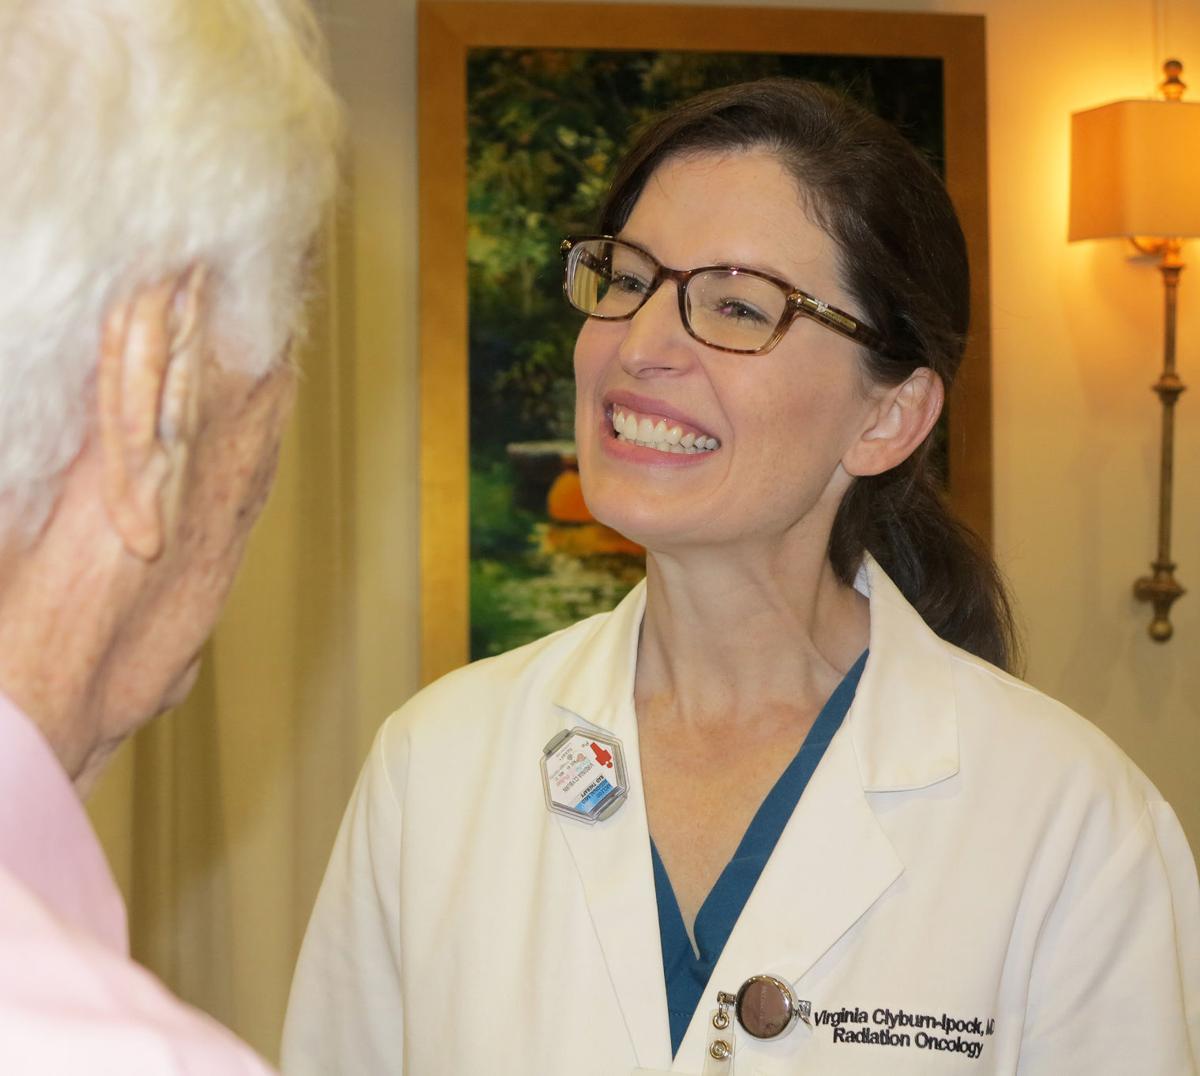 Dr. Virginia Clyburn-Ipock speaks to Rotarians